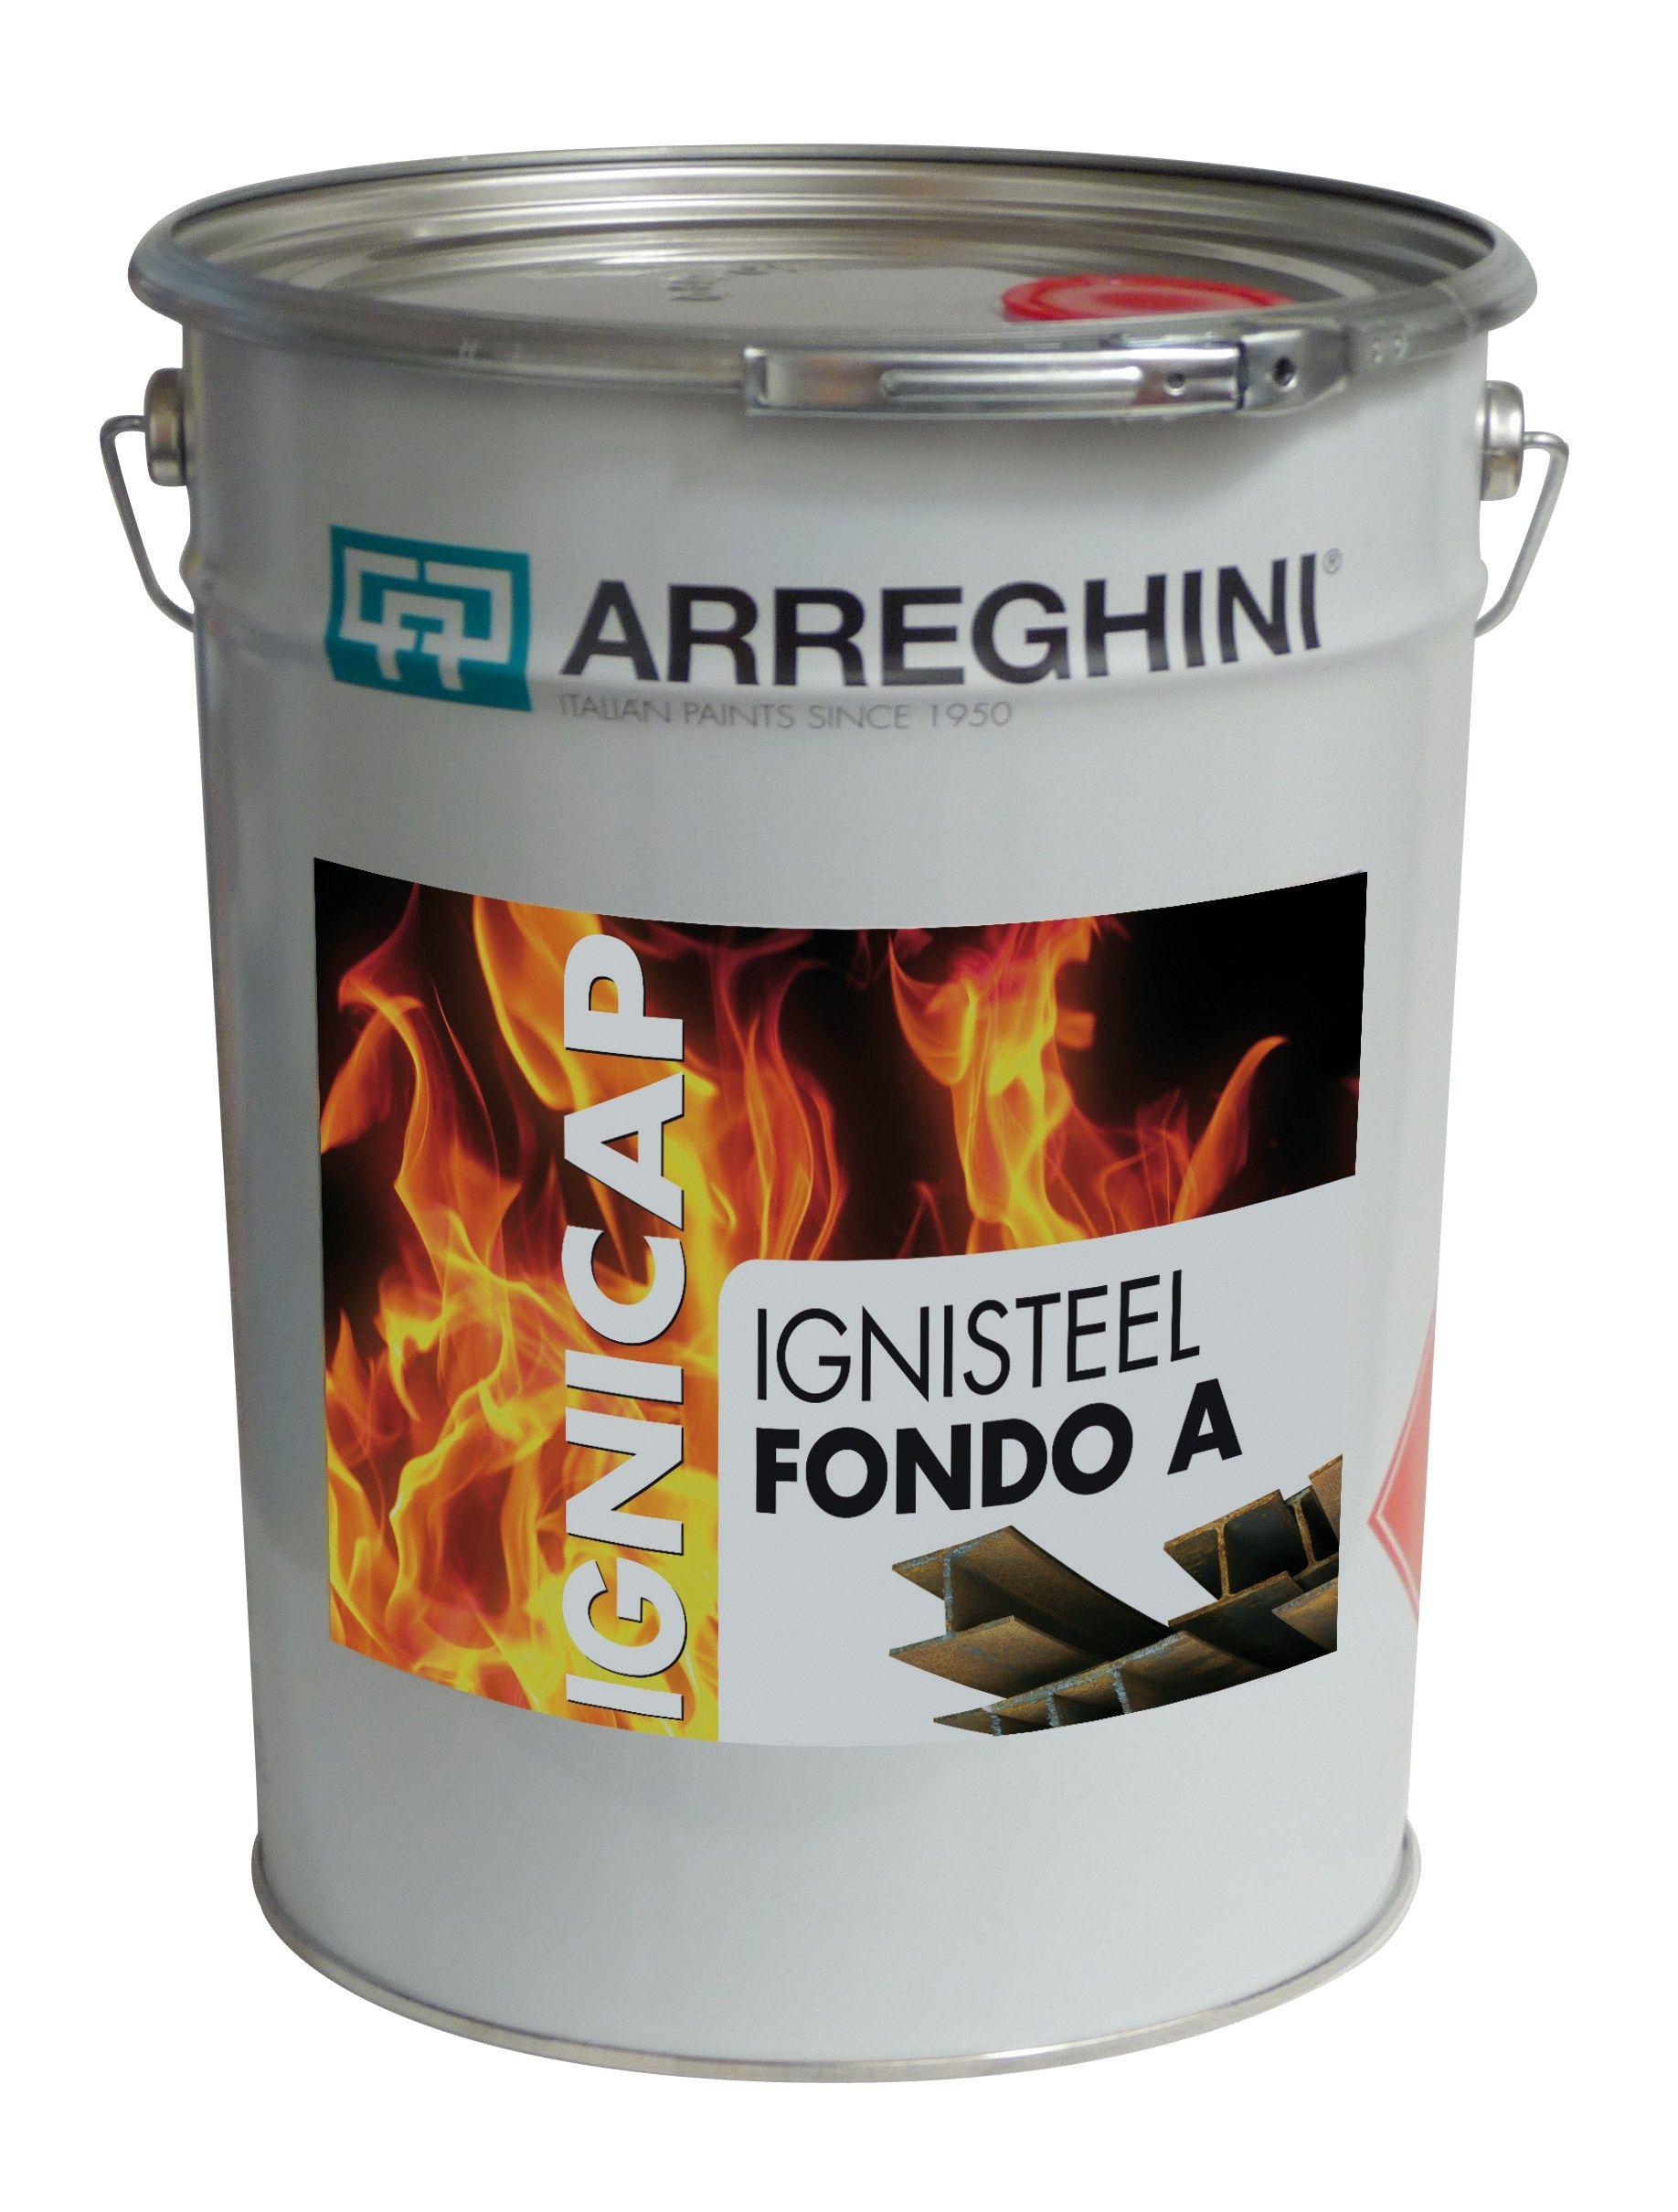 Fire Resistant Paint : Ignisteel fire retardant paint by cap arreghini